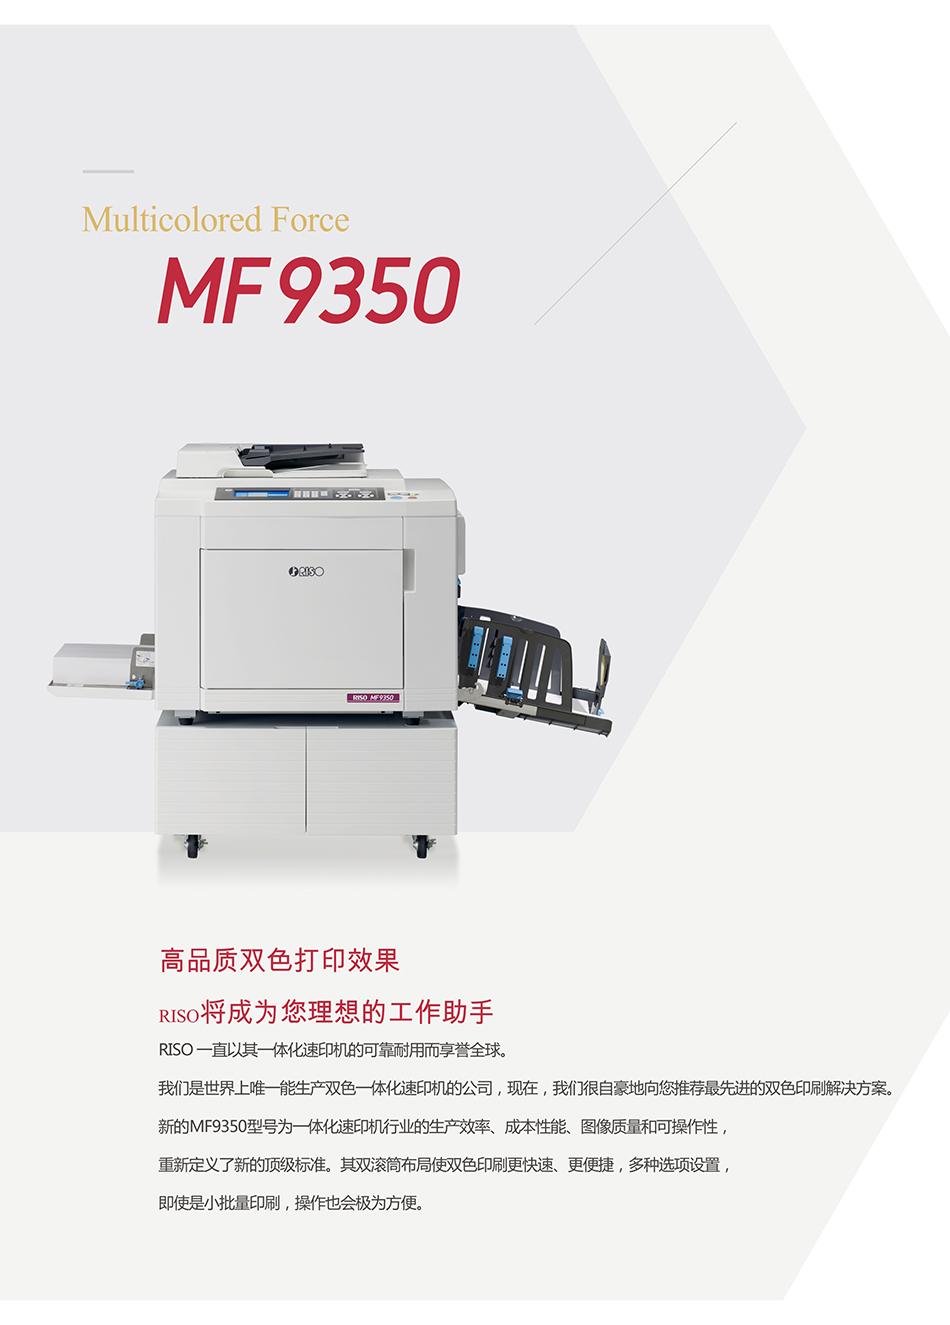 MF9350彩页--2-950.jpg